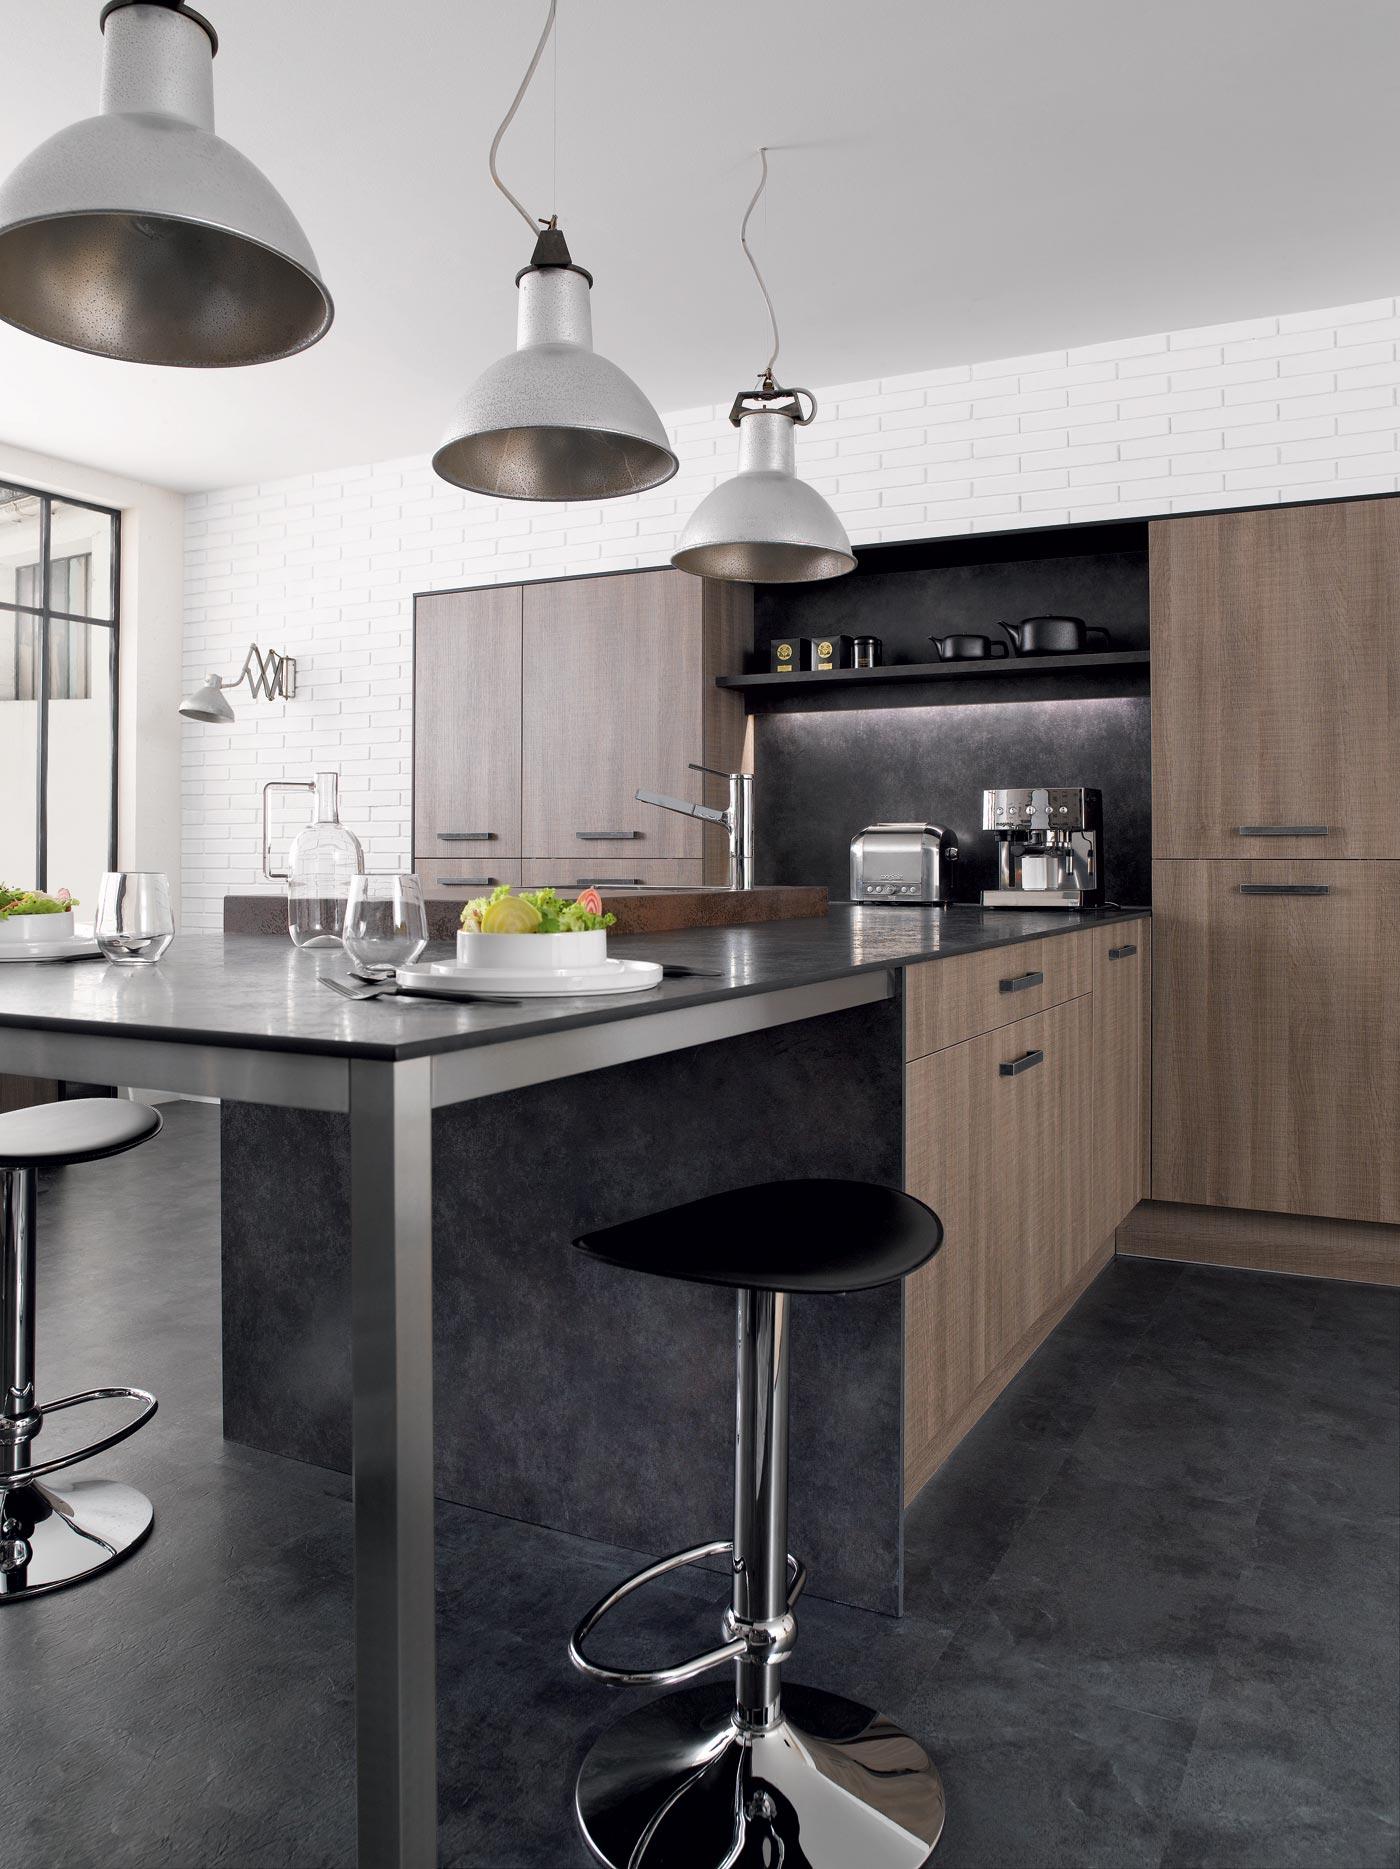 cuisine m100 m lamin rustica gris perene lyon. Black Bedroom Furniture Sets. Home Design Ideas